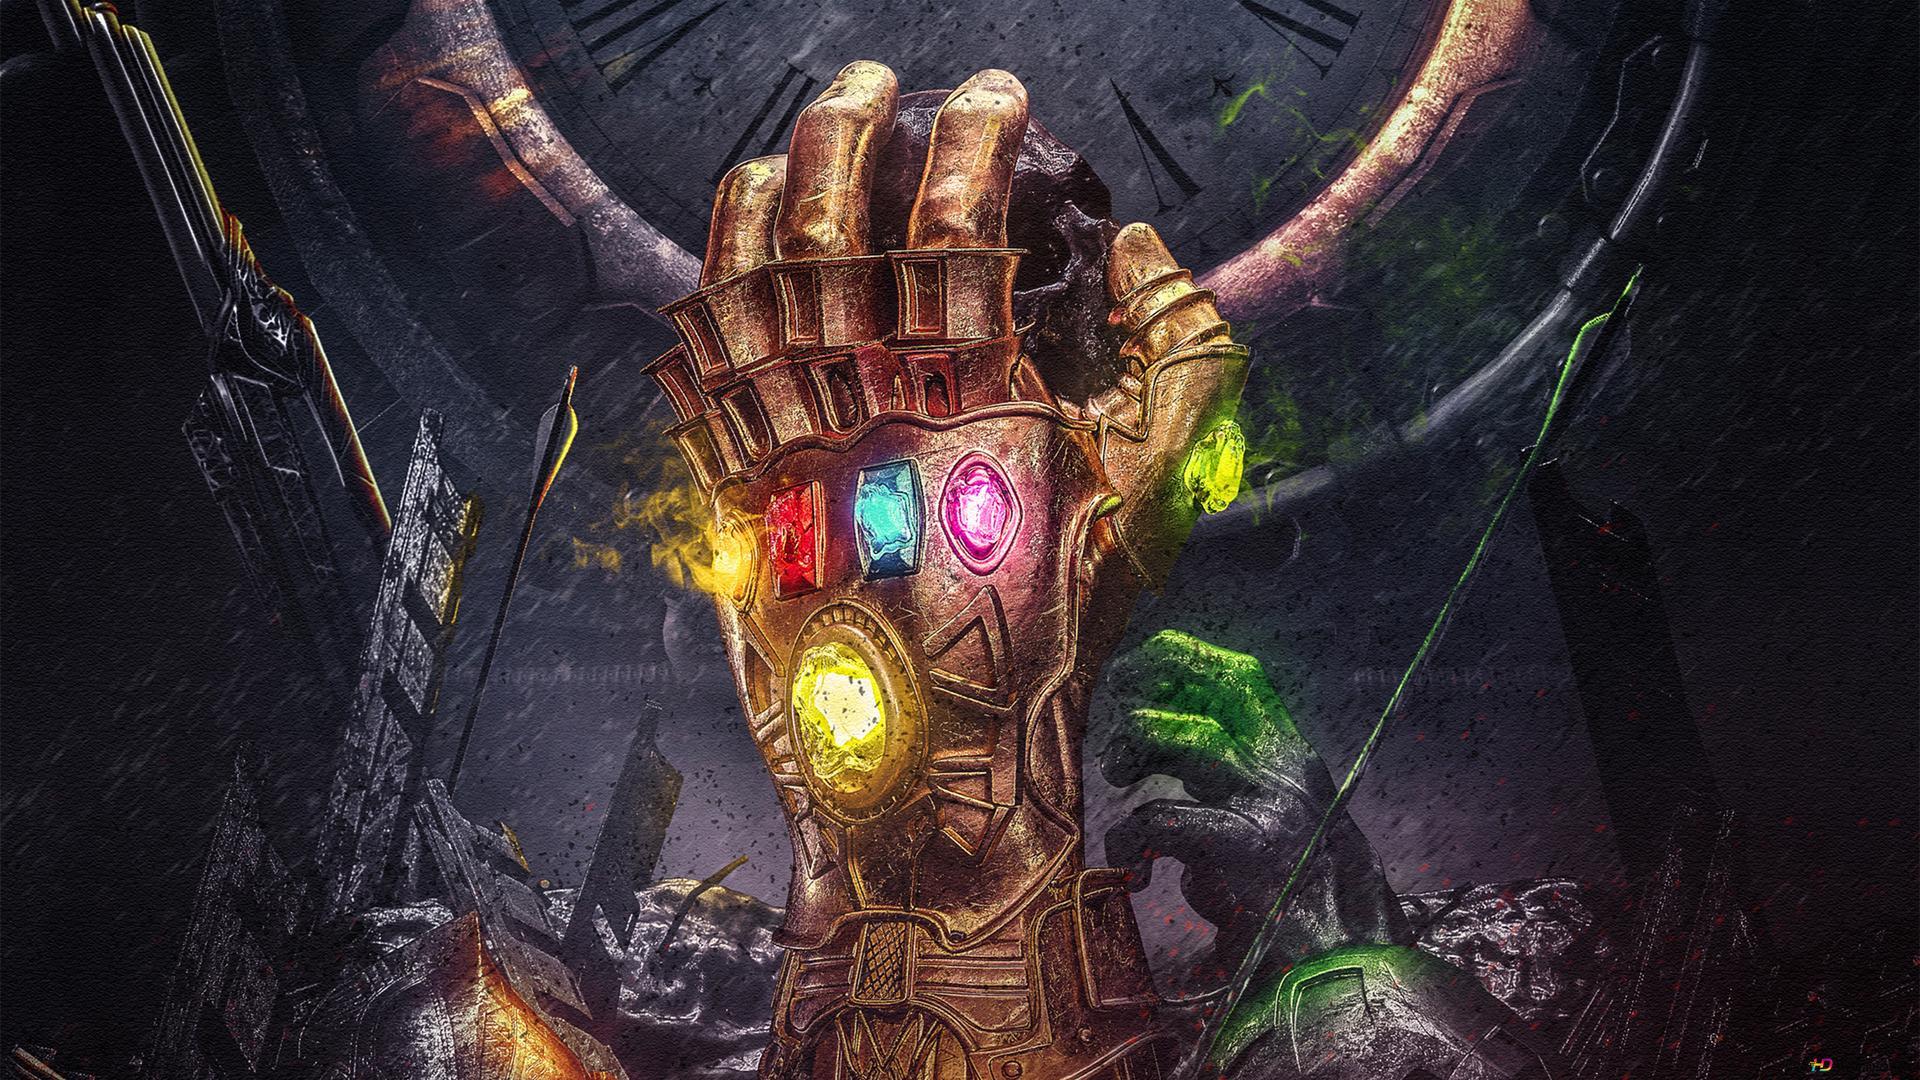 Avengers Endgame Infinity Gauntlet Painting Hd Wallpaper Download